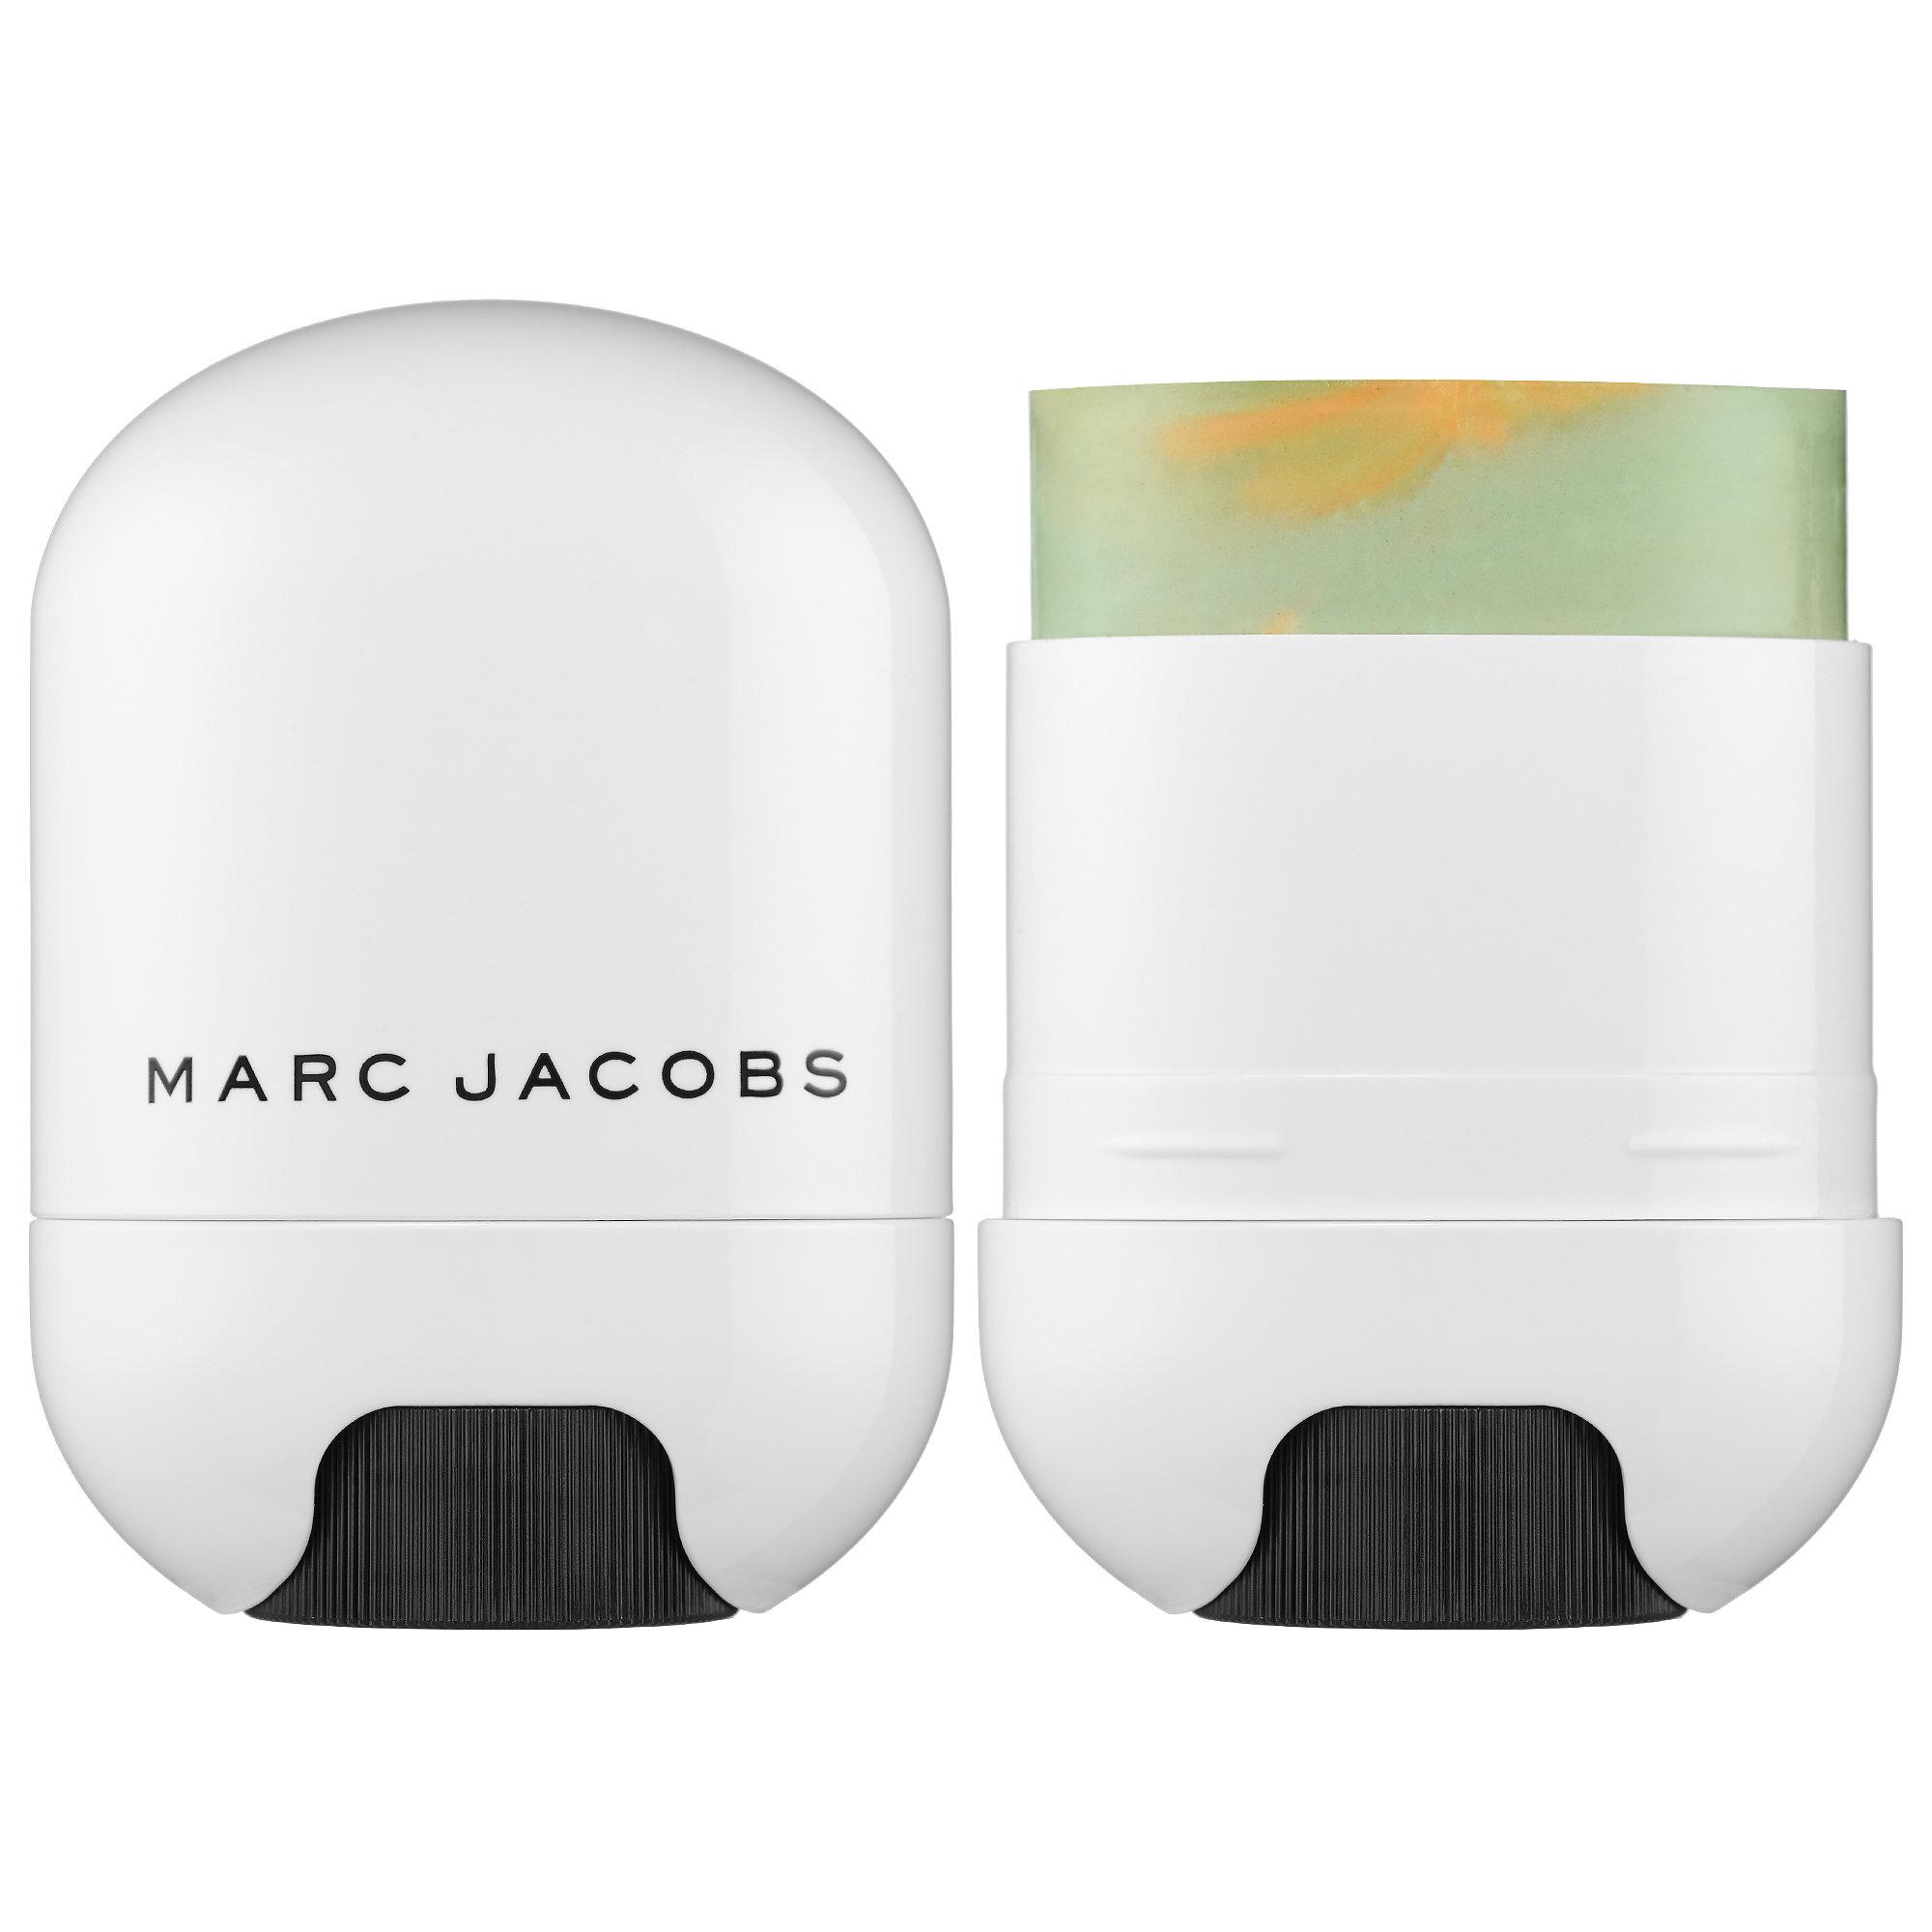 marcjacobs.jpg